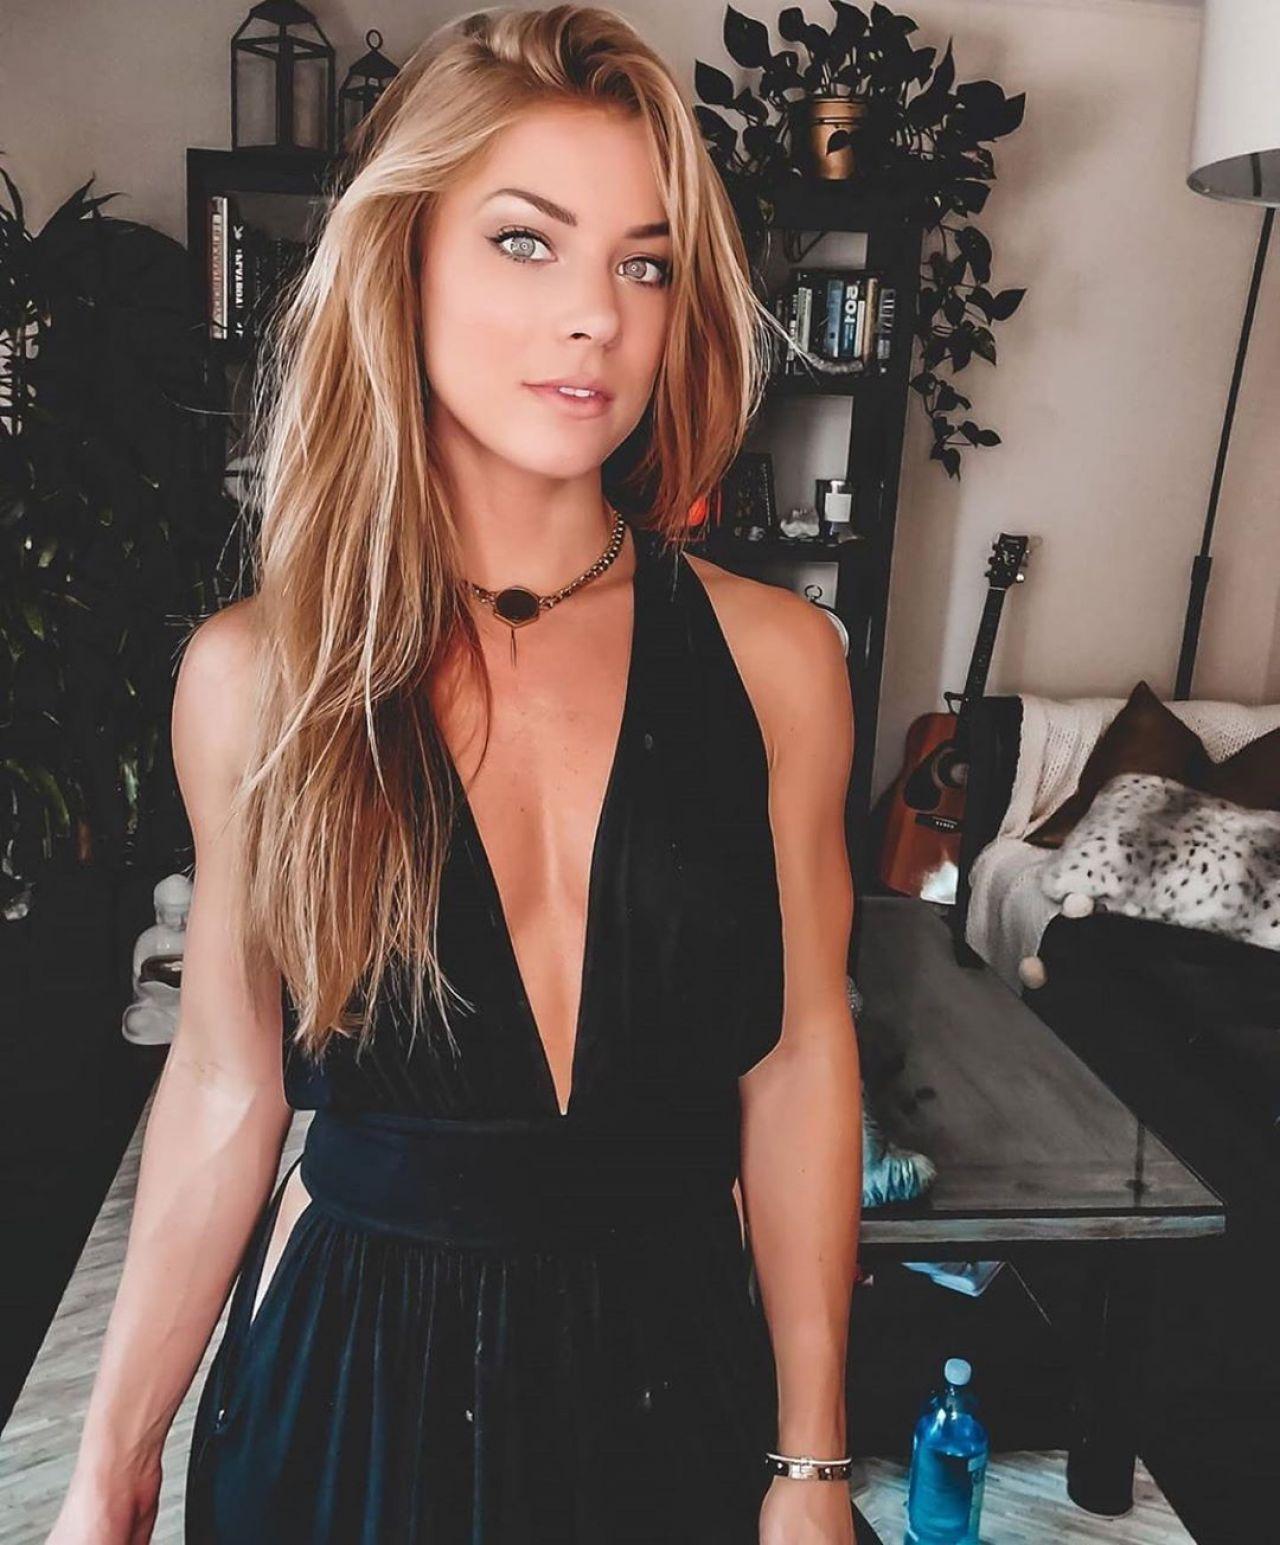 Nikki Leigh - Live Stream Video and Photos 05/13/2020